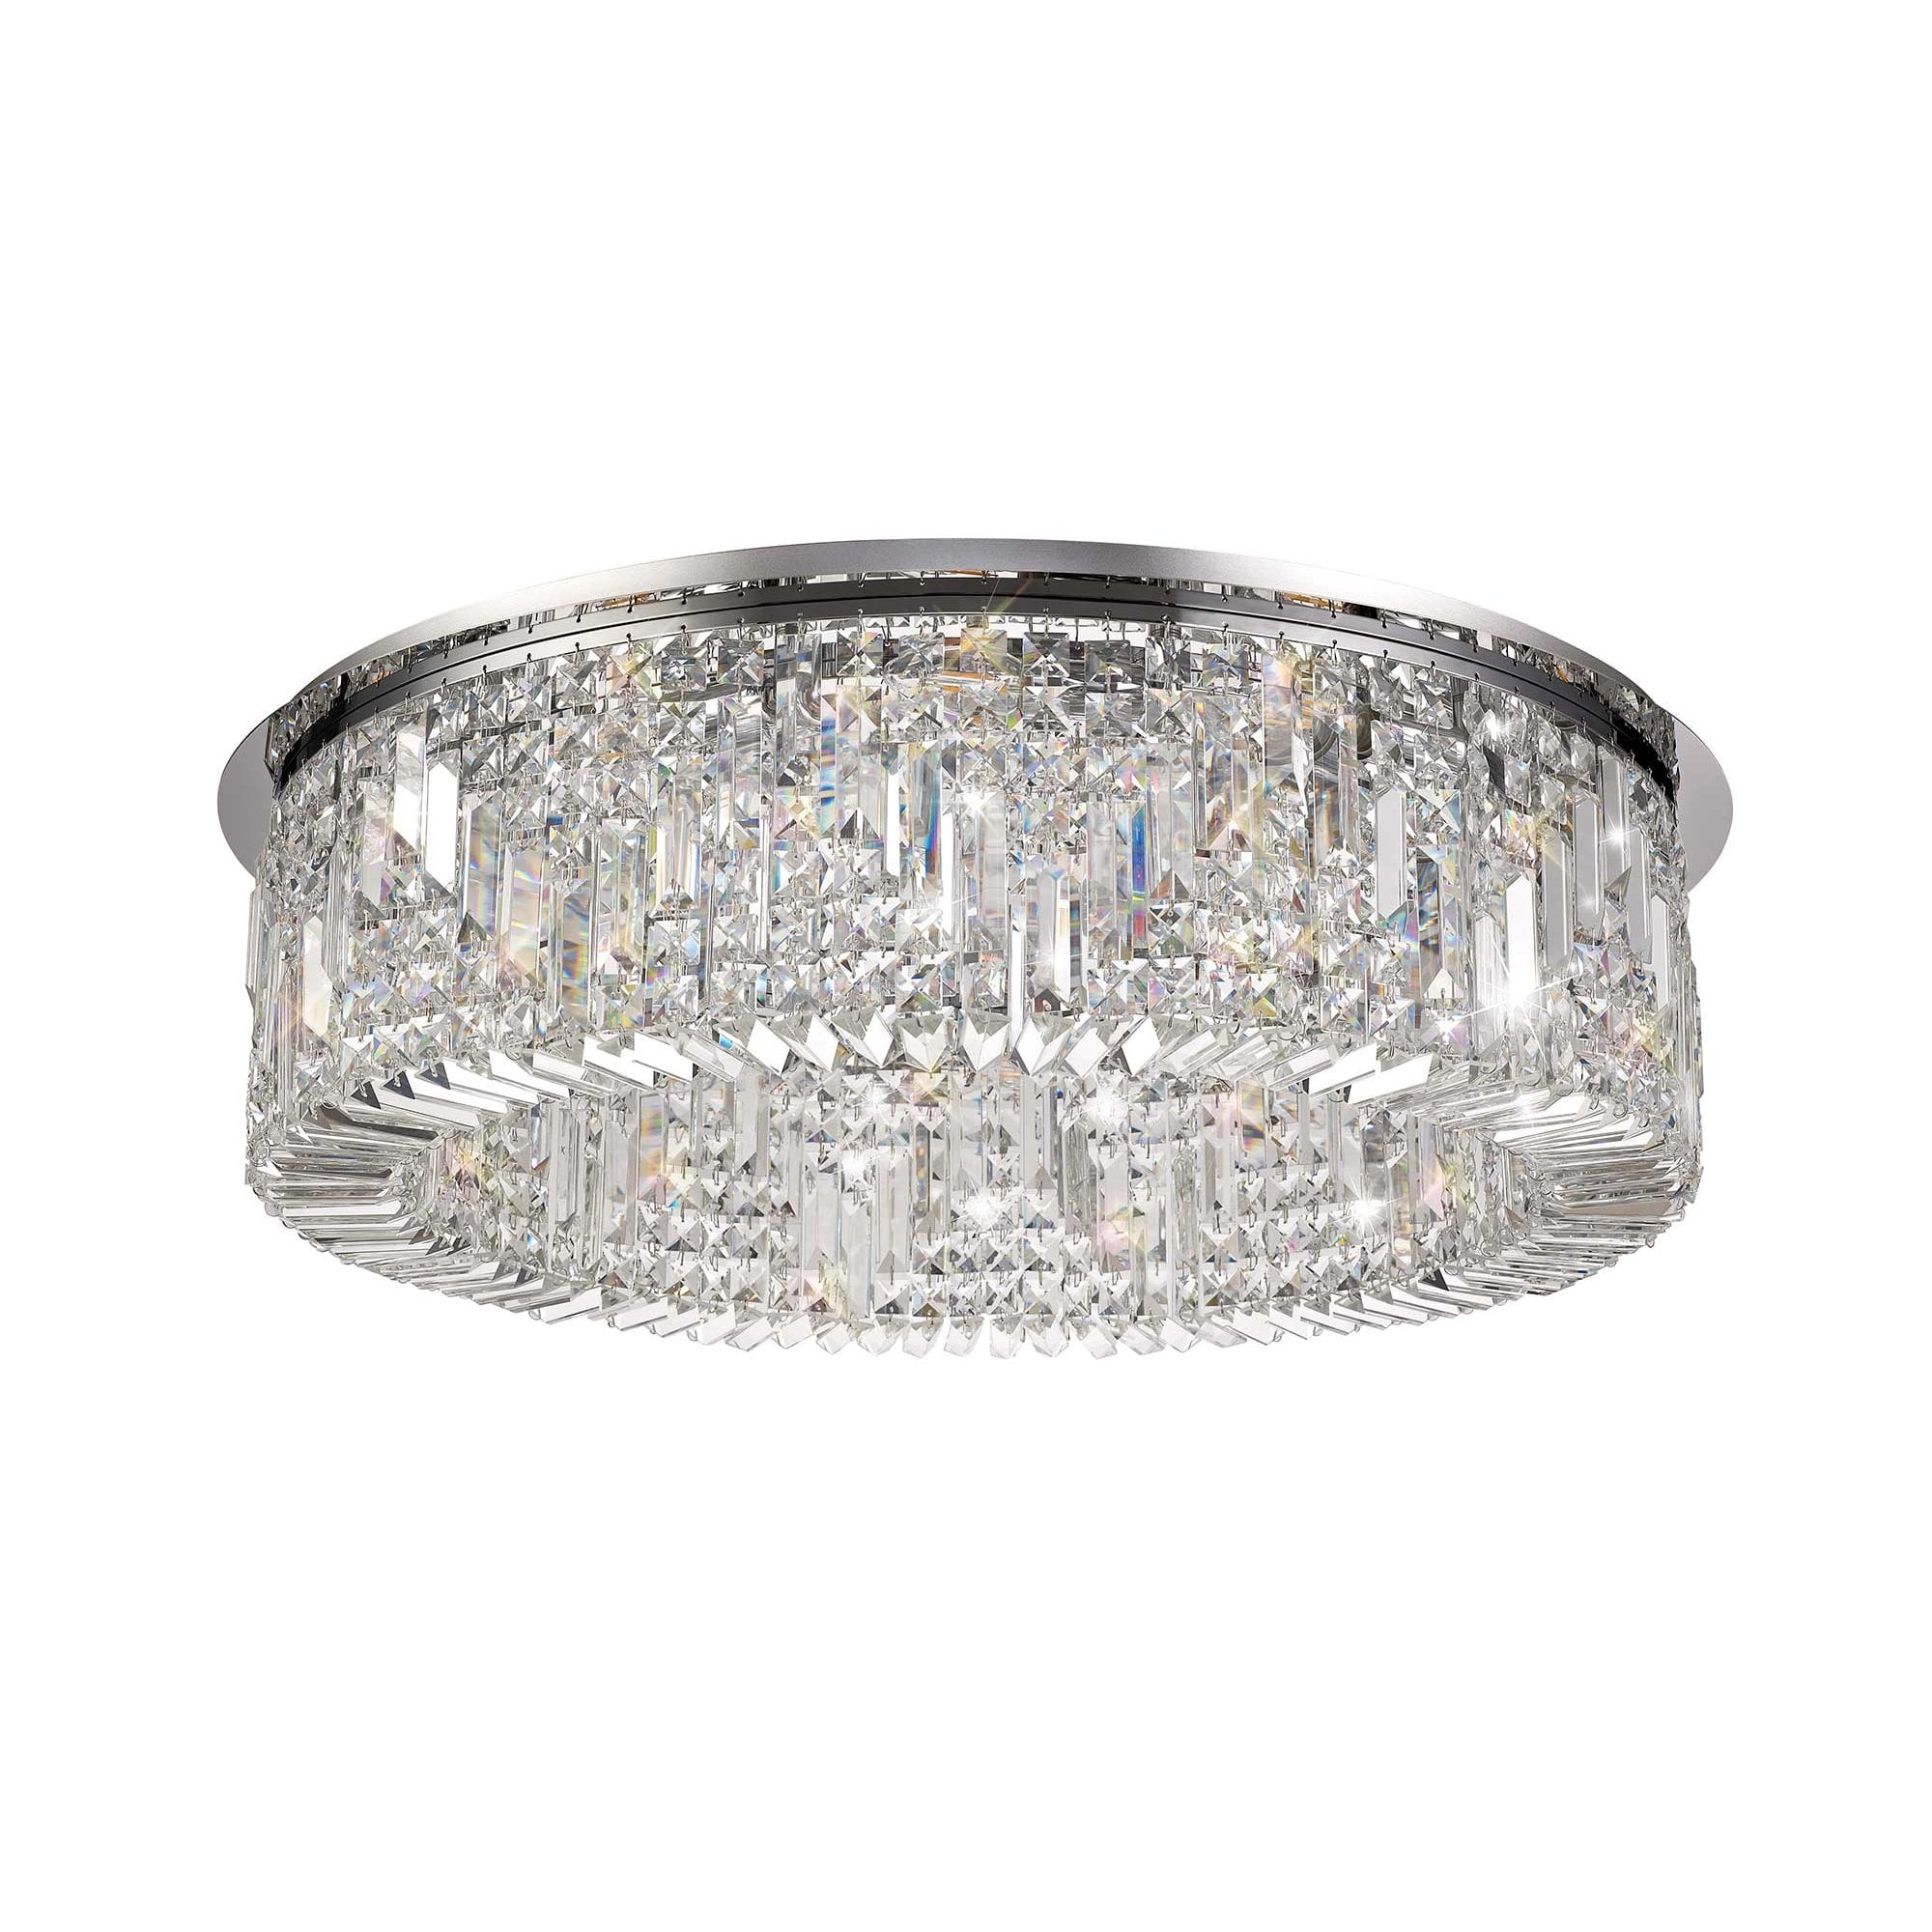 Large Crystal Ceiling Light Sparkly Lighting Lighting Company Uk